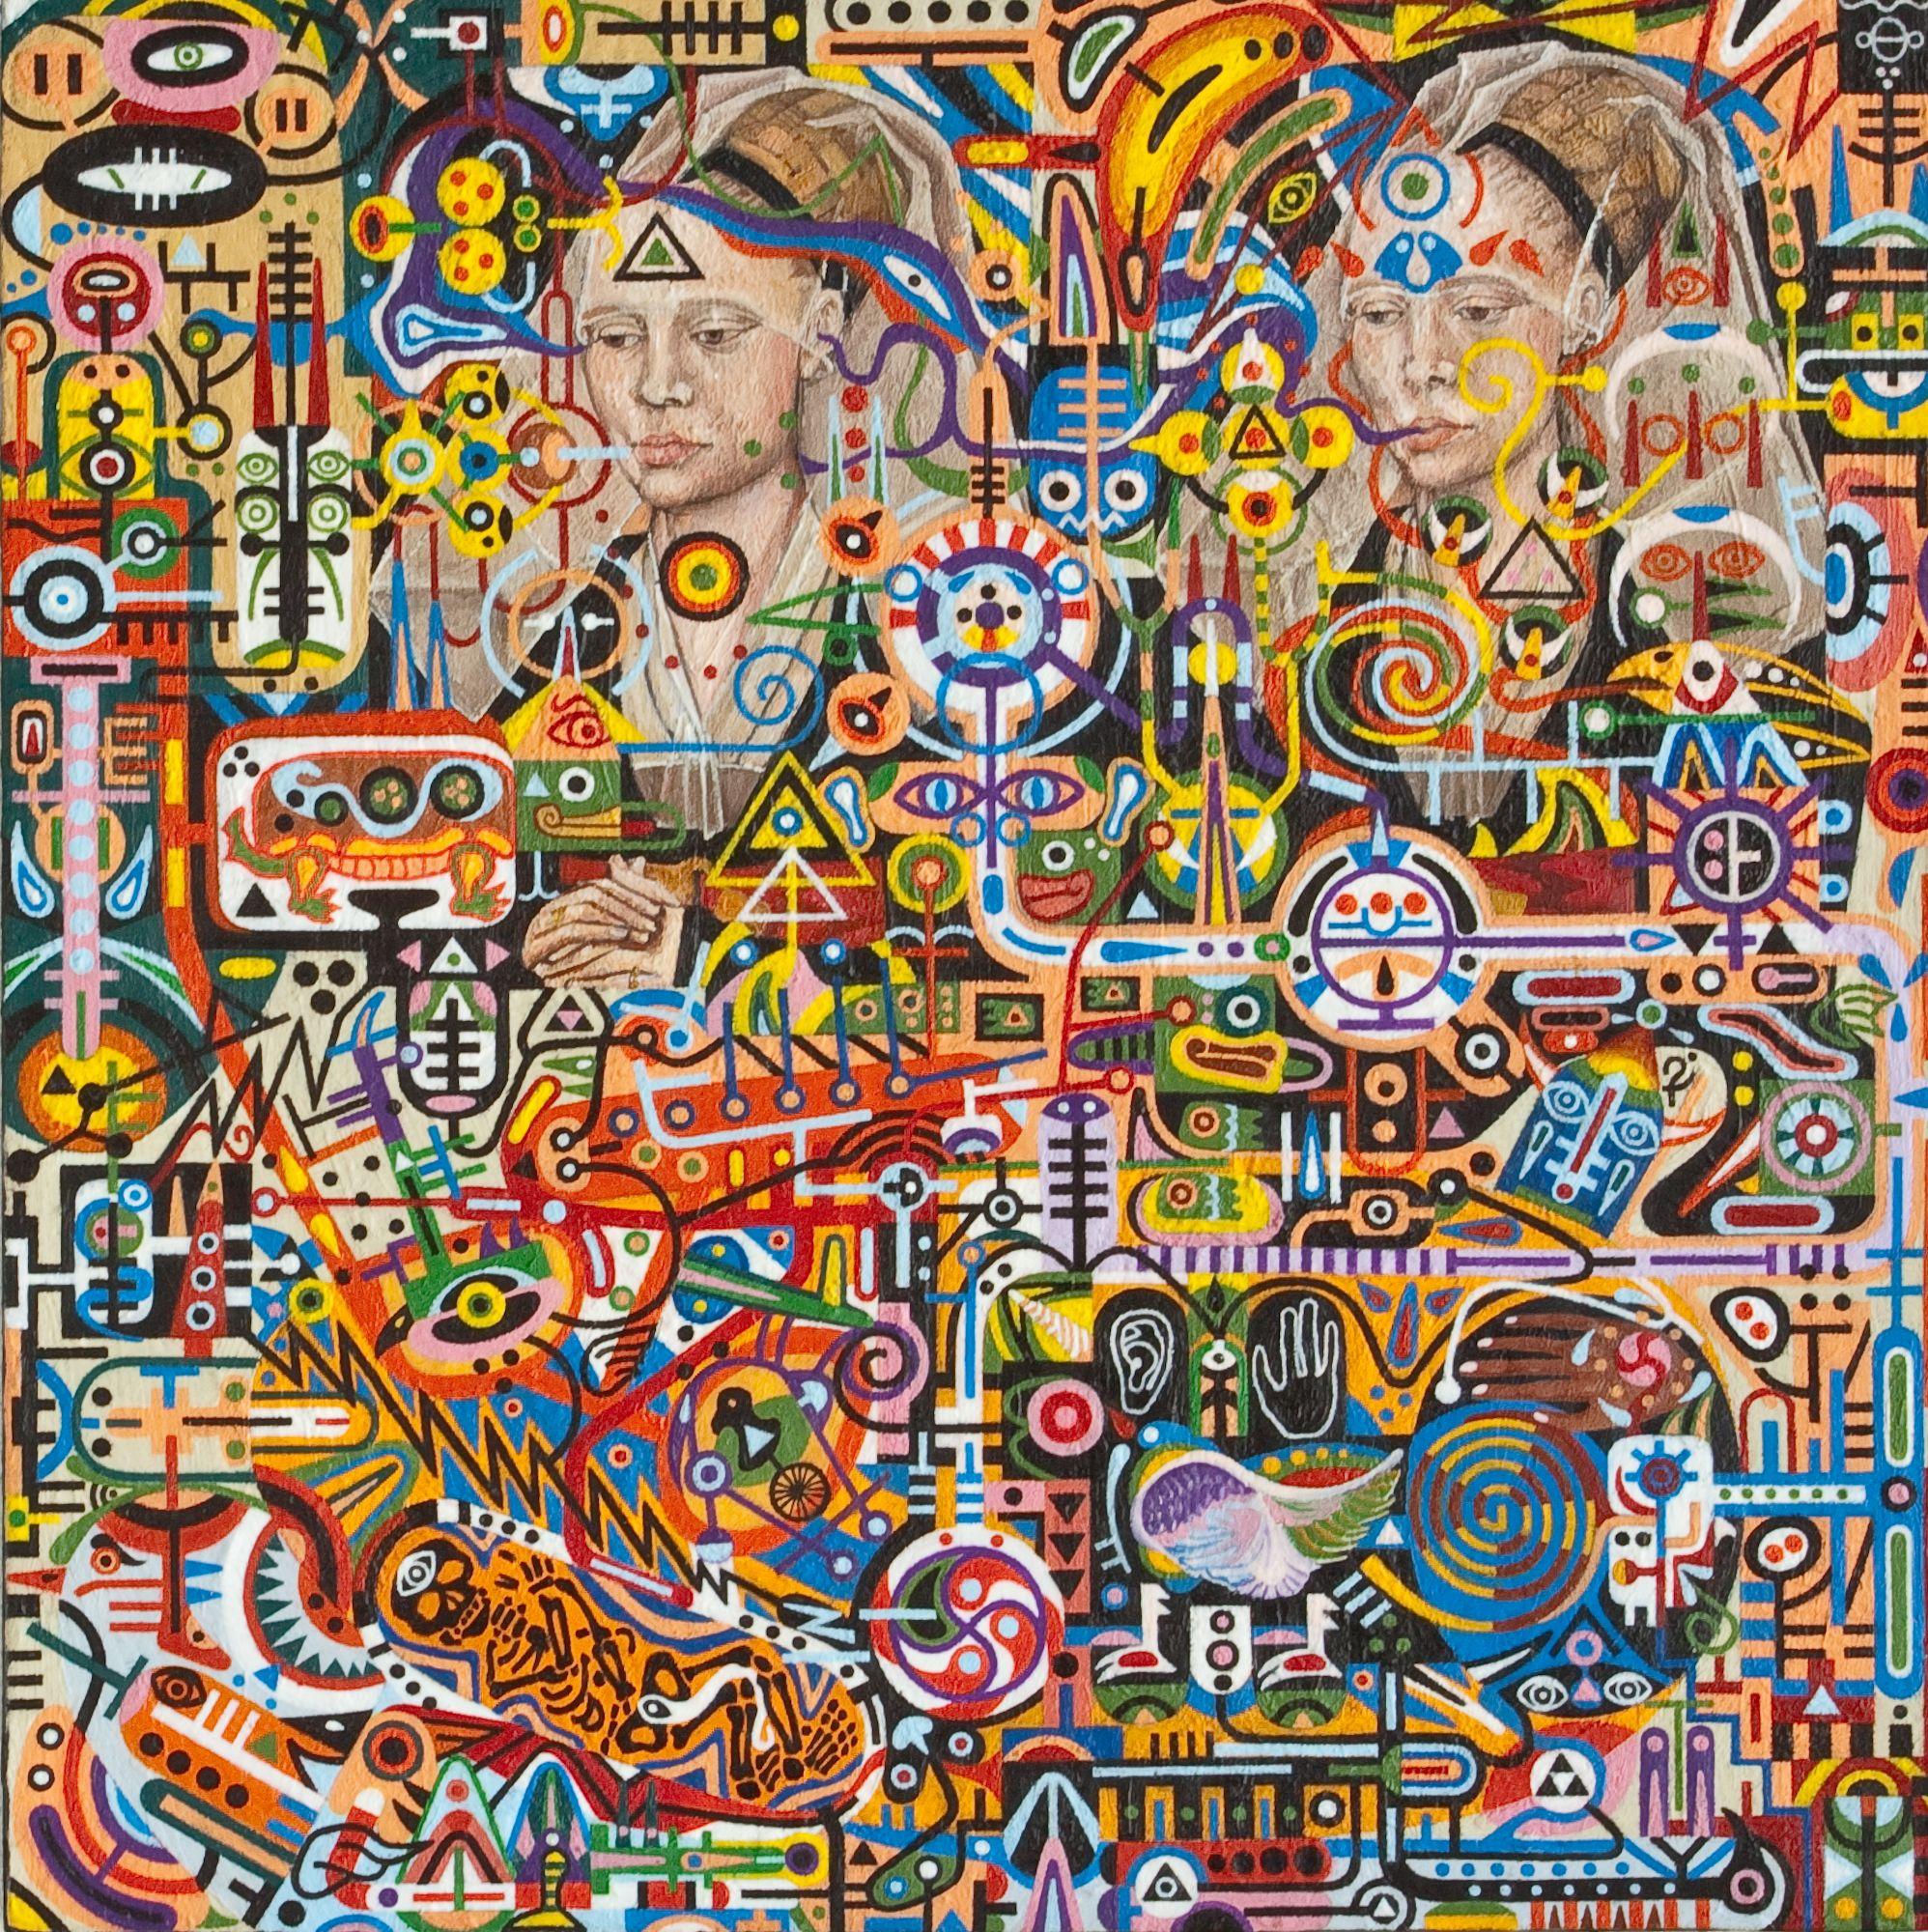 Shawn Thornton | kunst | Kunst